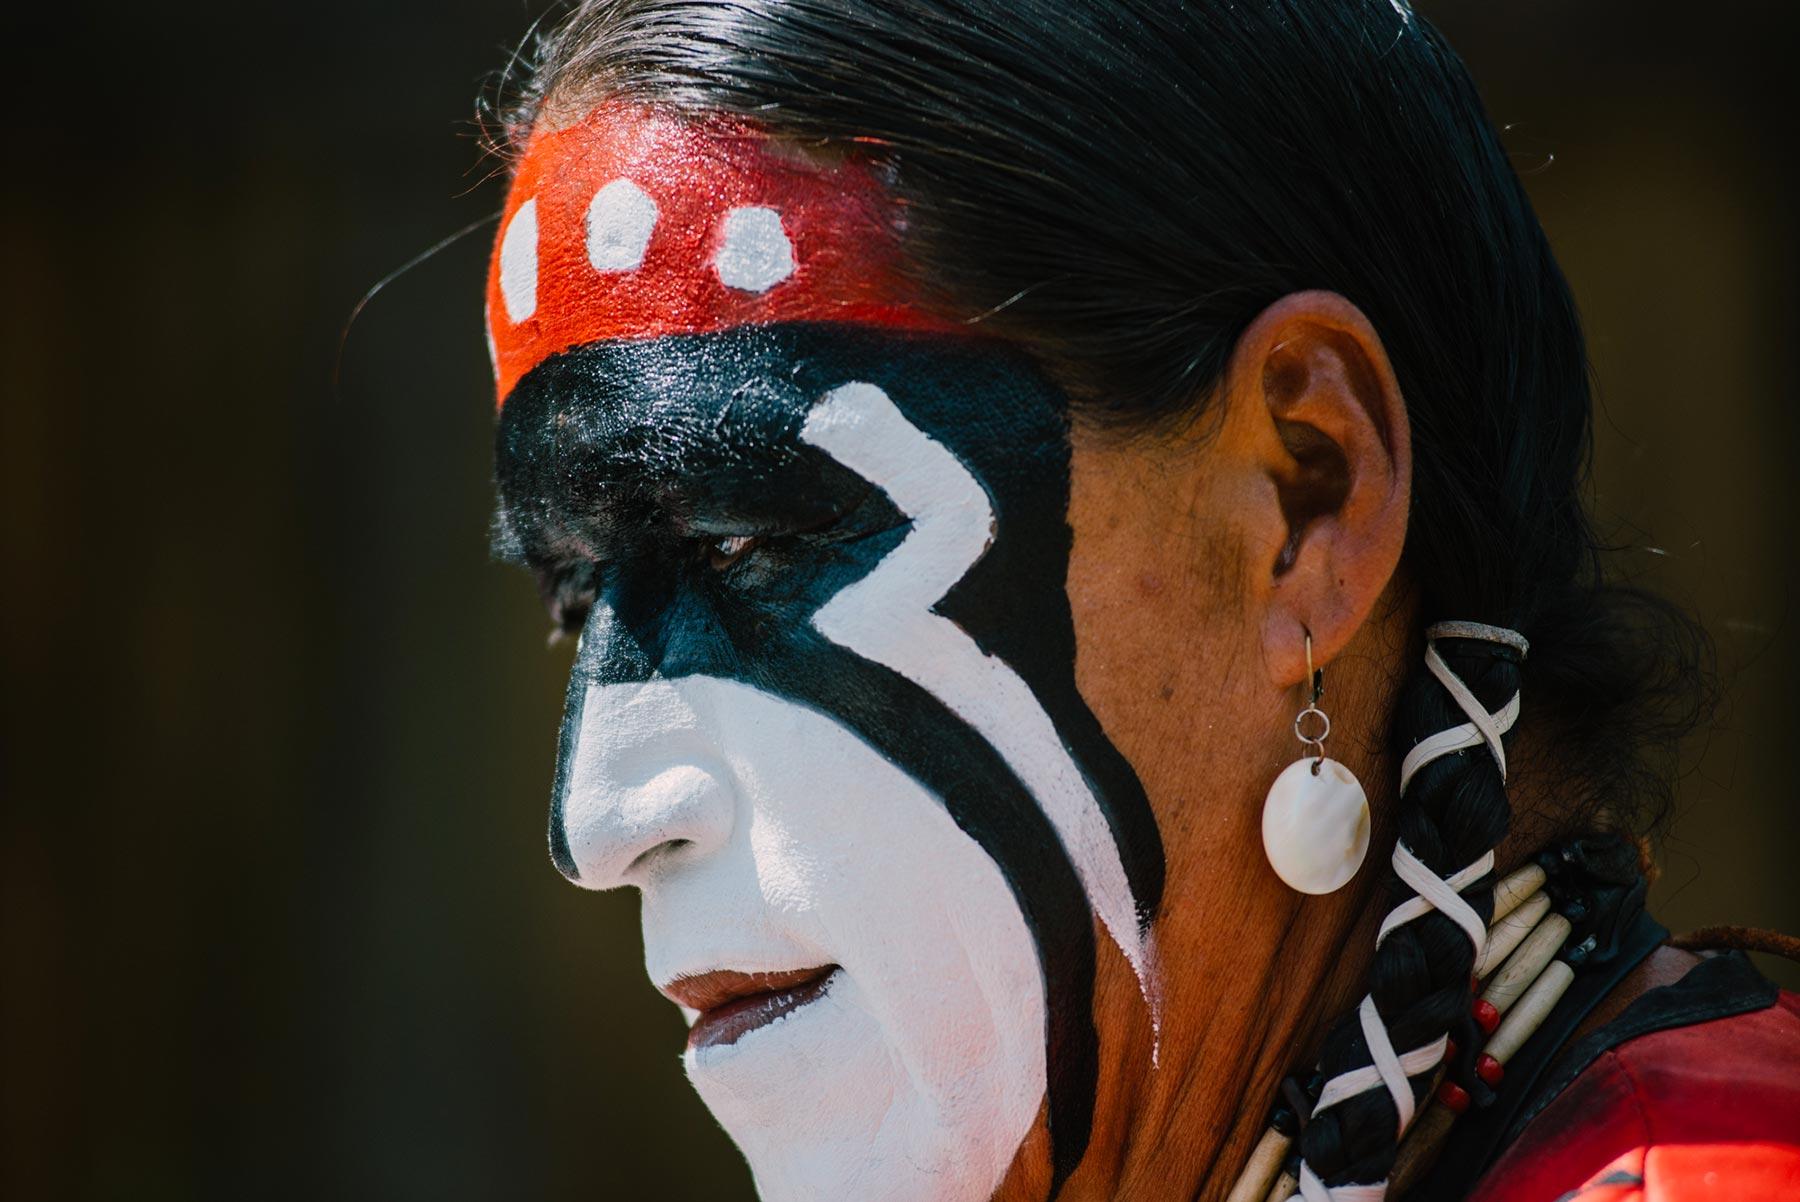 Maquillage visage - Pow wow Abitibi360